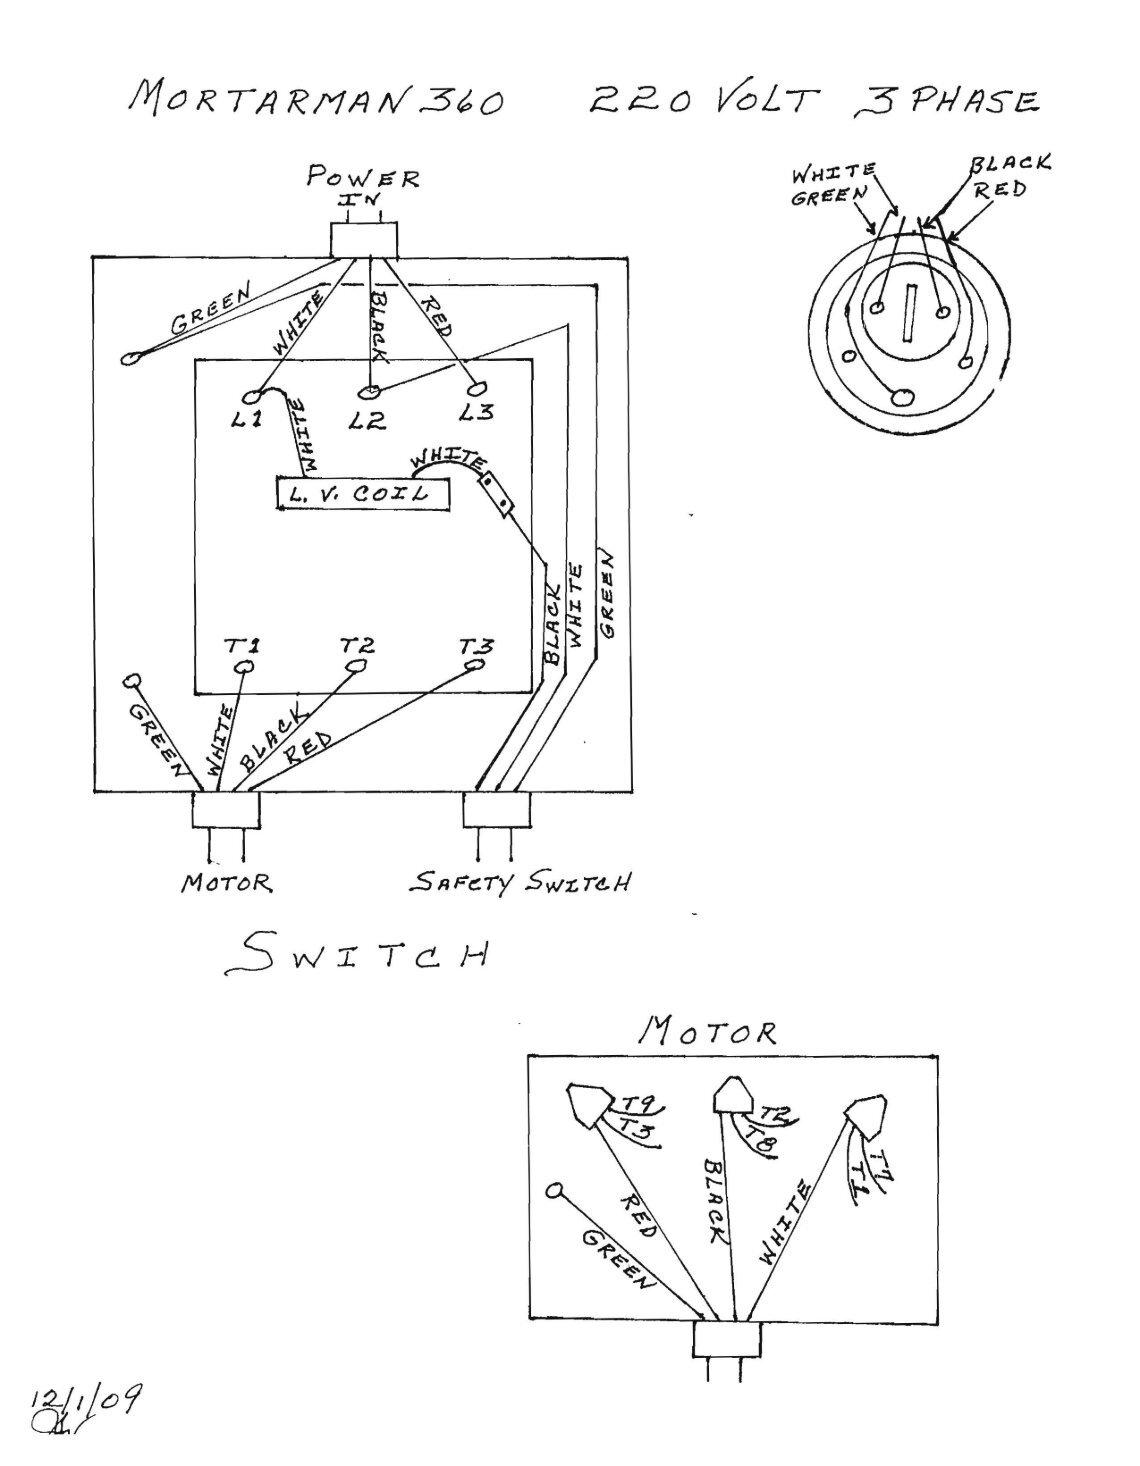 single phase ac motor wiring wiring diagram database 110-Volt Outlet Wiring Diagram 220 3 phase wiring diagram wiring diagram database single phase electrical 50 free magazines from imerusa